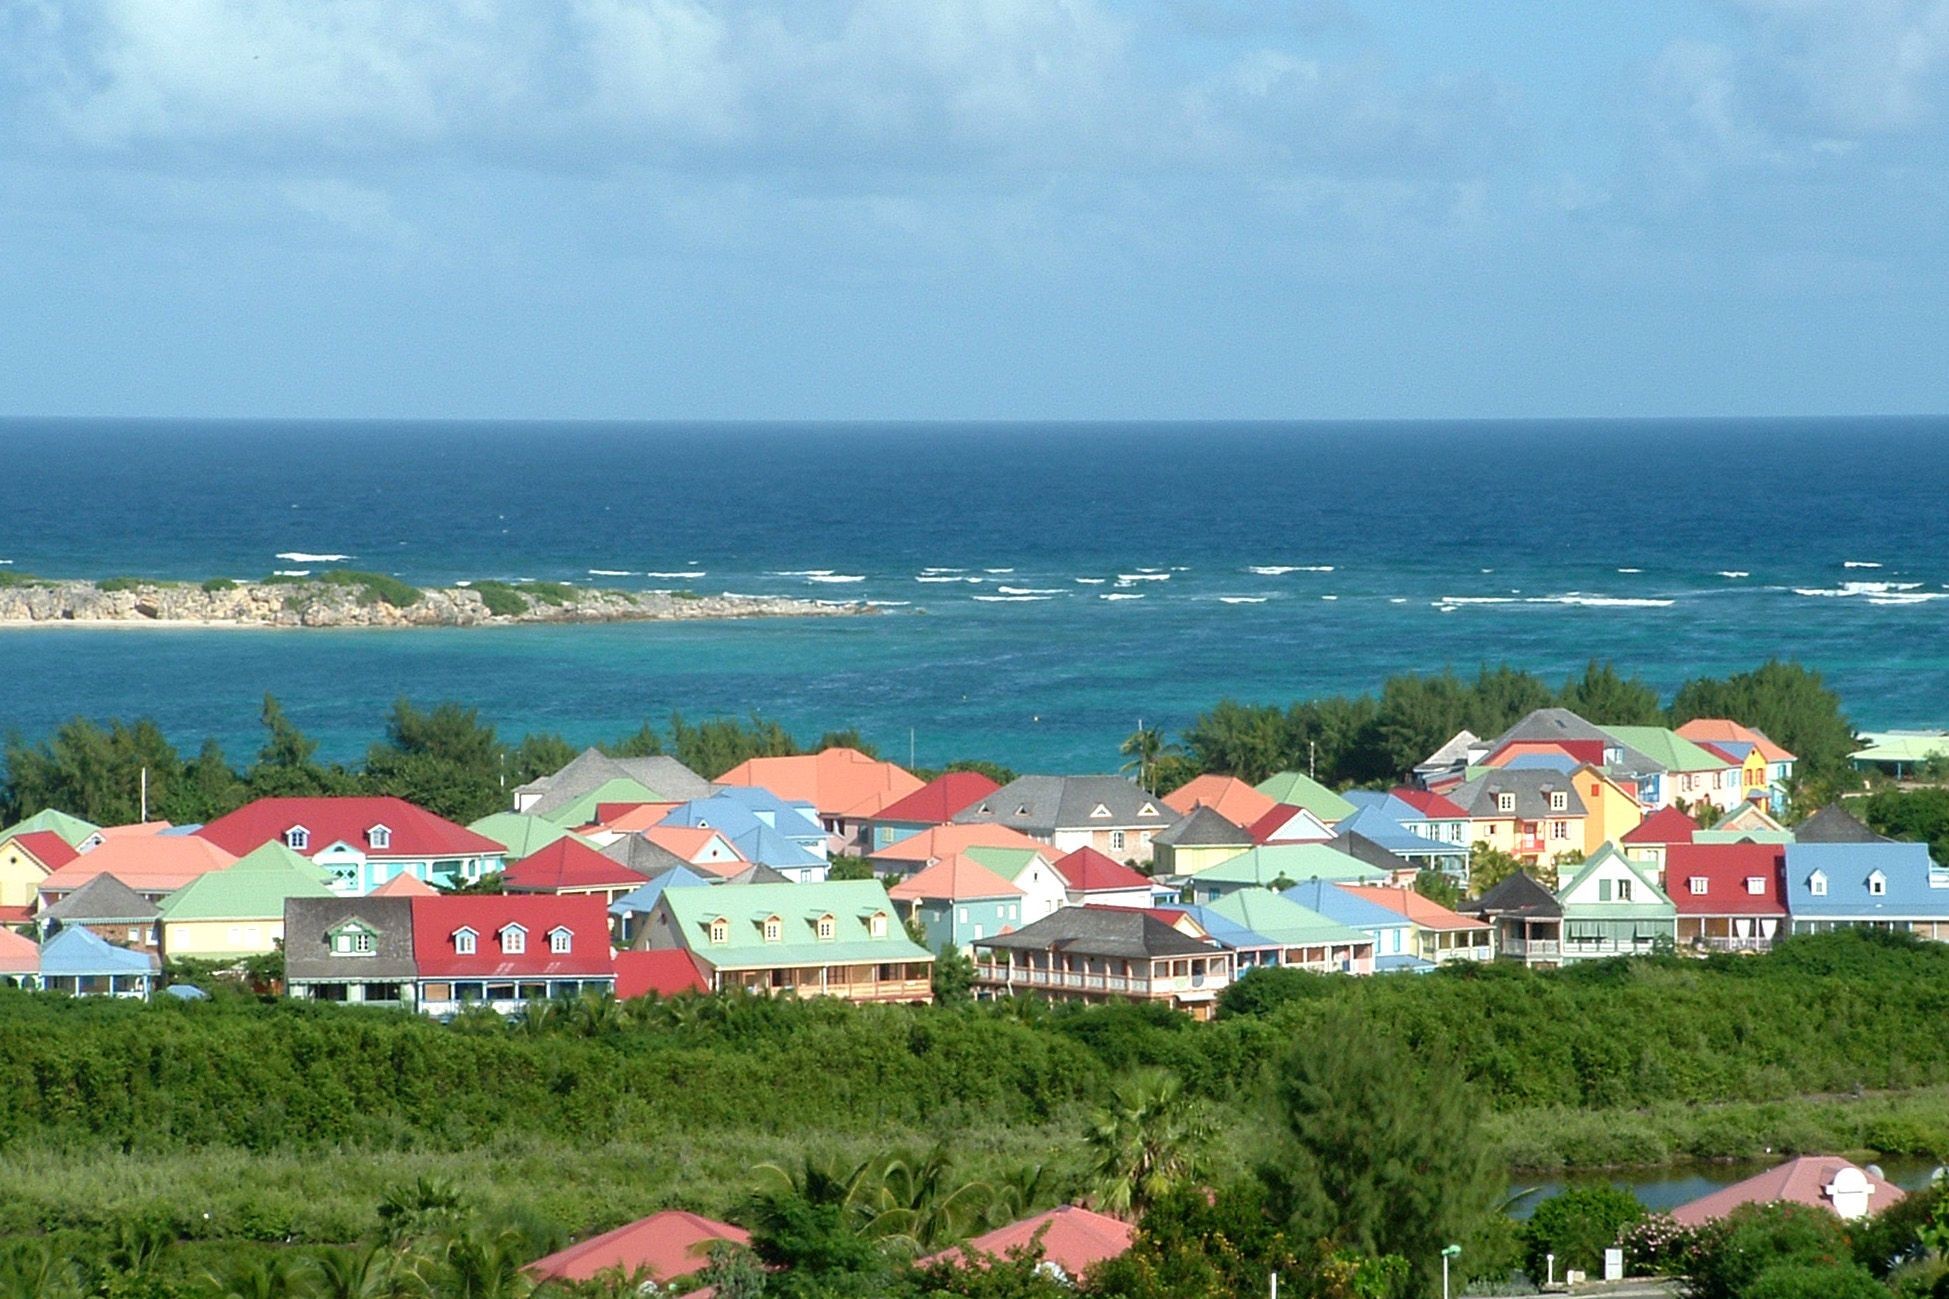 Orient Beach, St. Maarten | Saint martin island, Places to